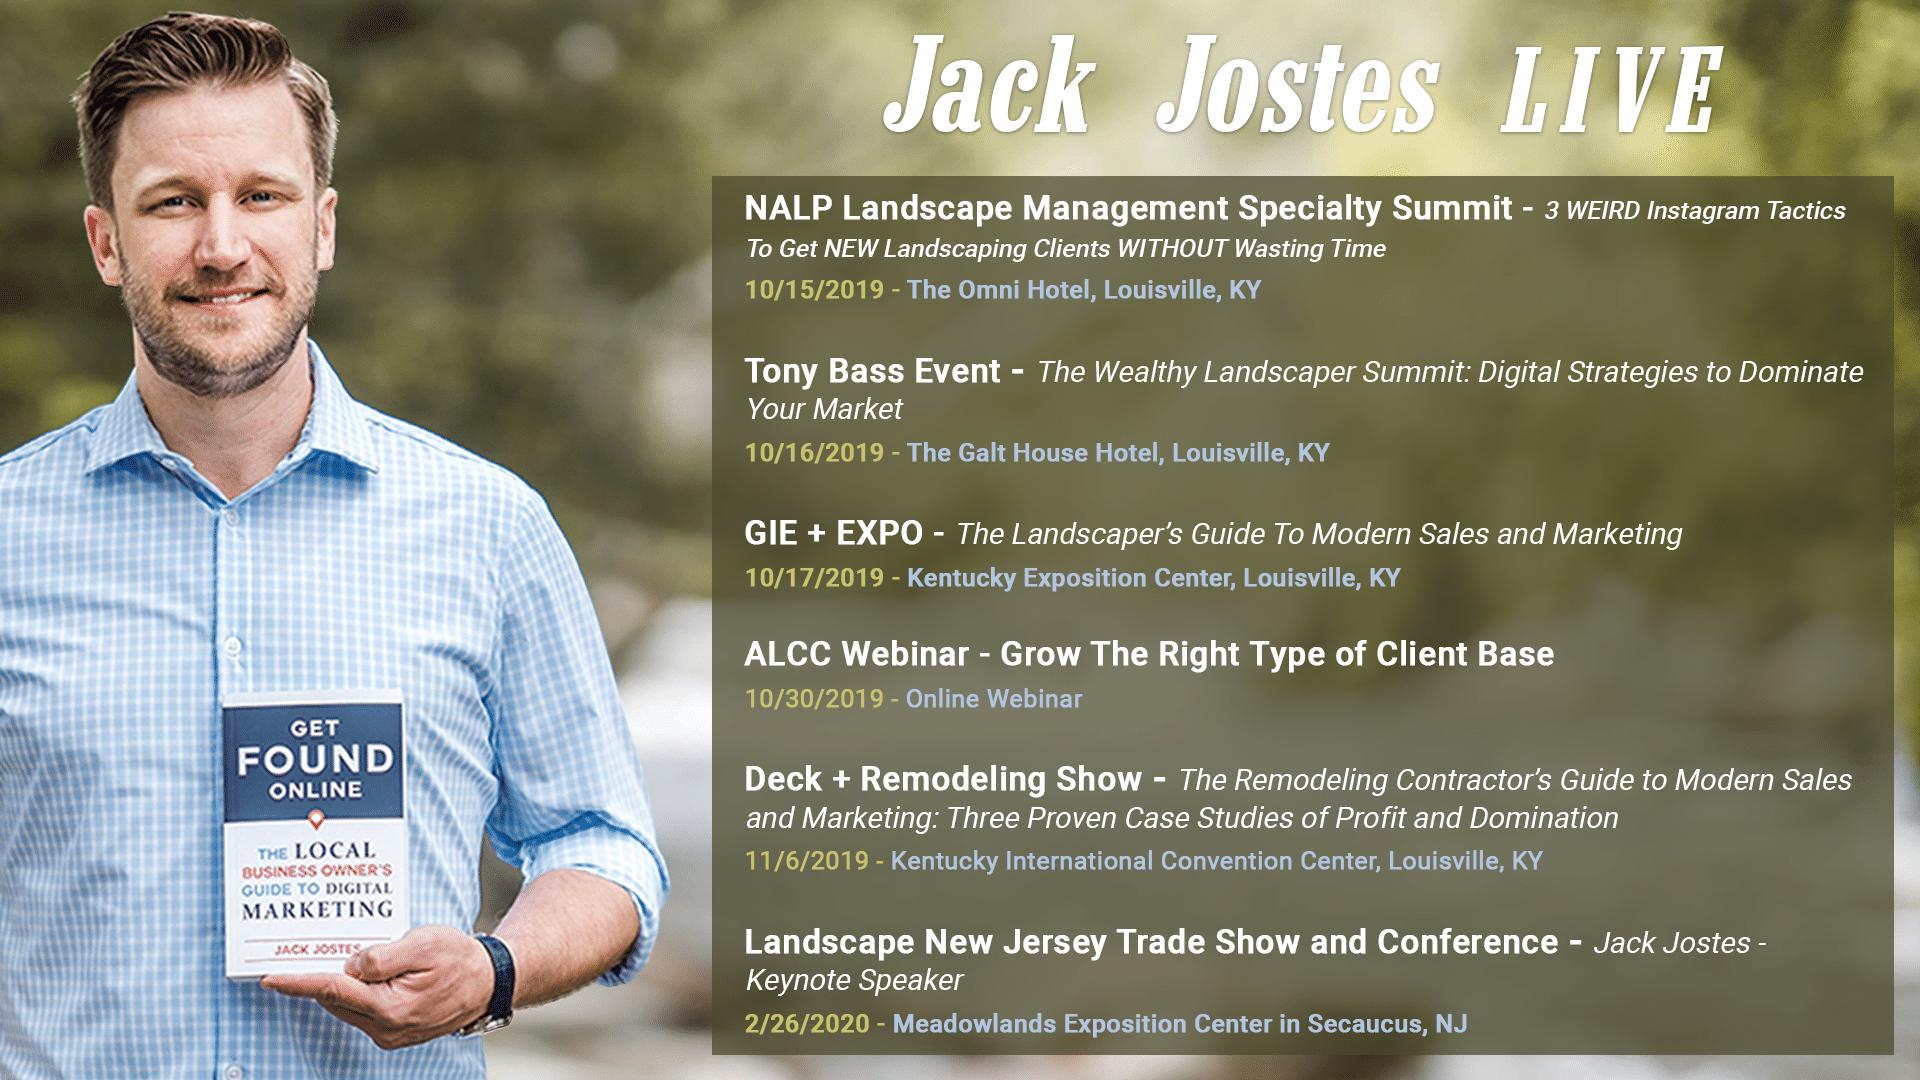 Jack Jostes Speaking LIVE